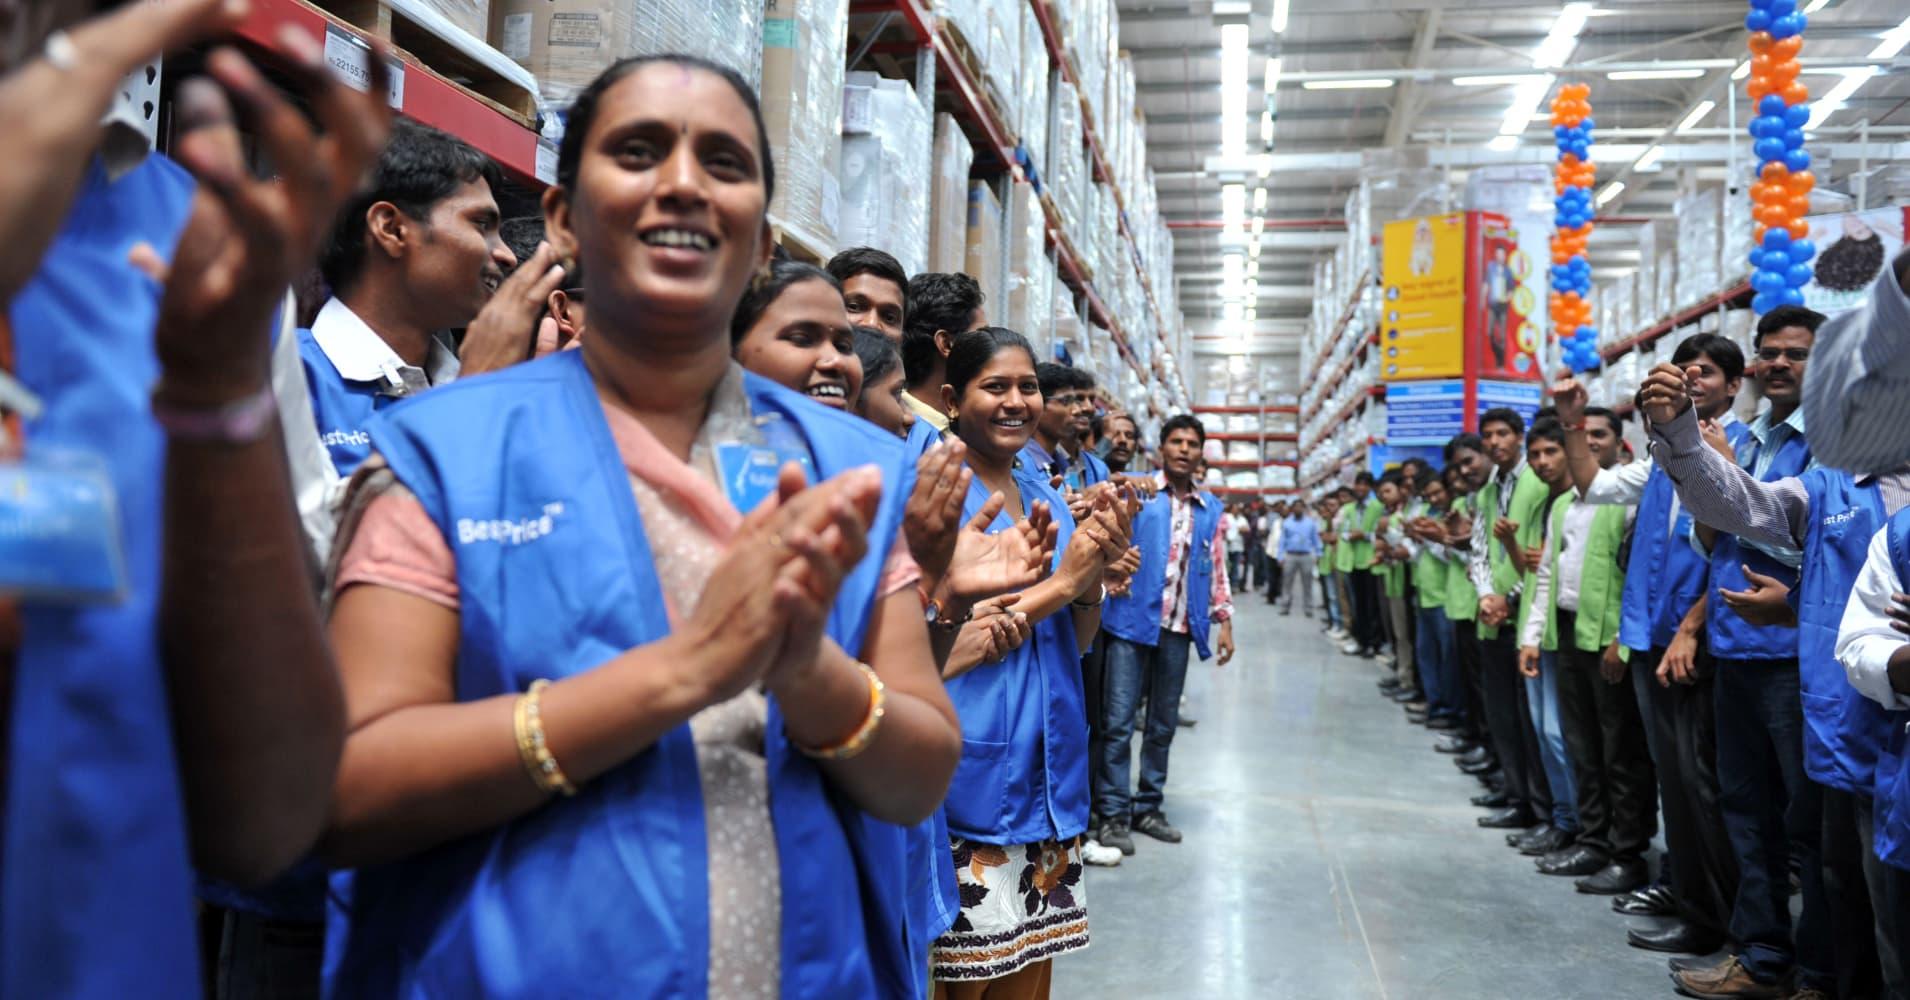 Walmart Suspends India Employees